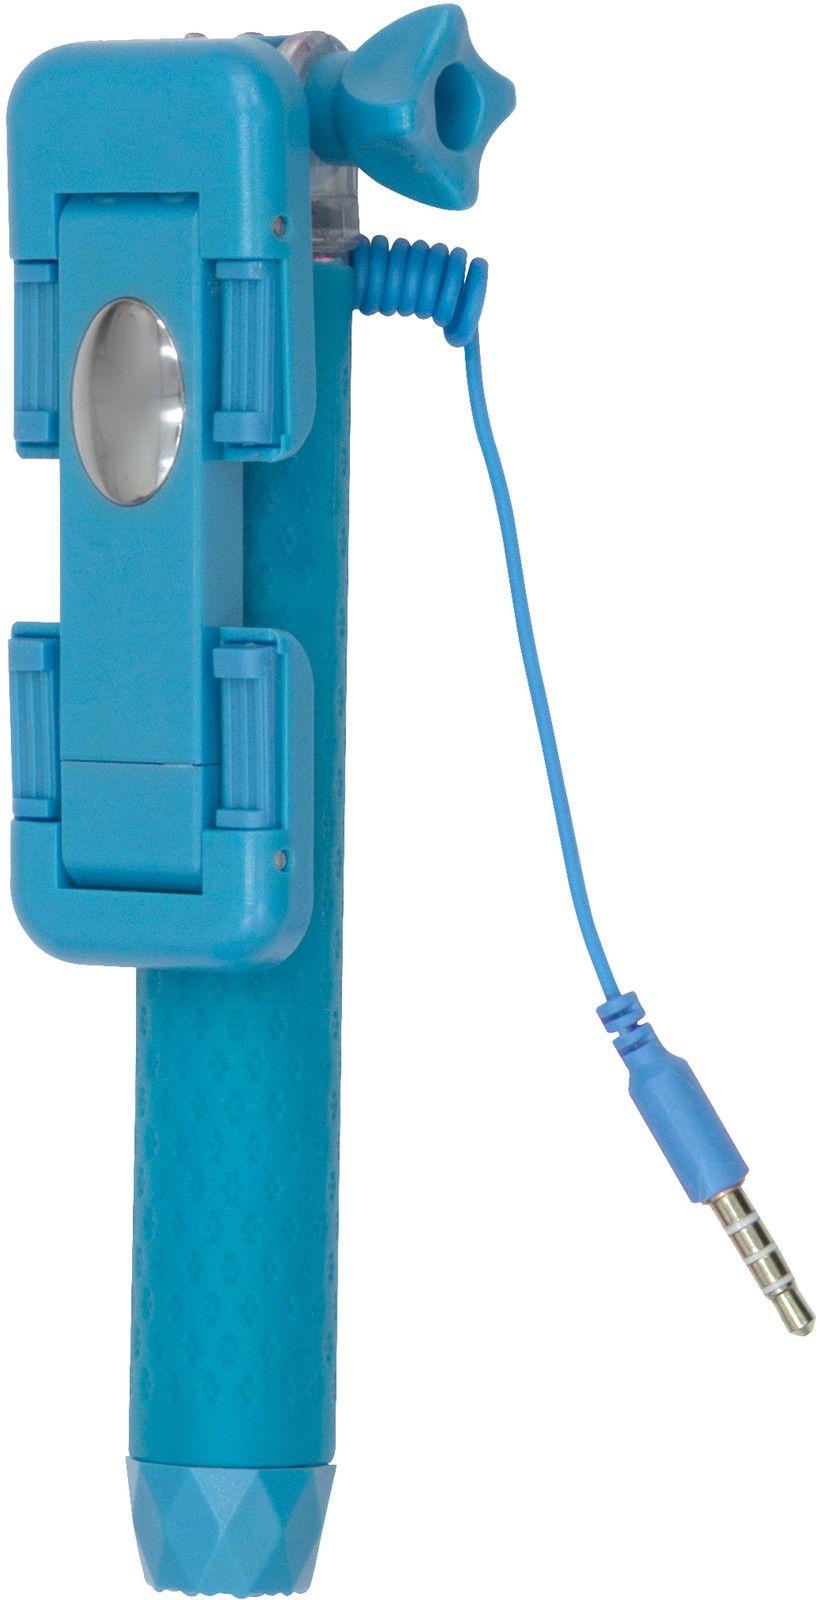 Kitvision Wired Pocket Selfie Stick (iPhone) - Blå